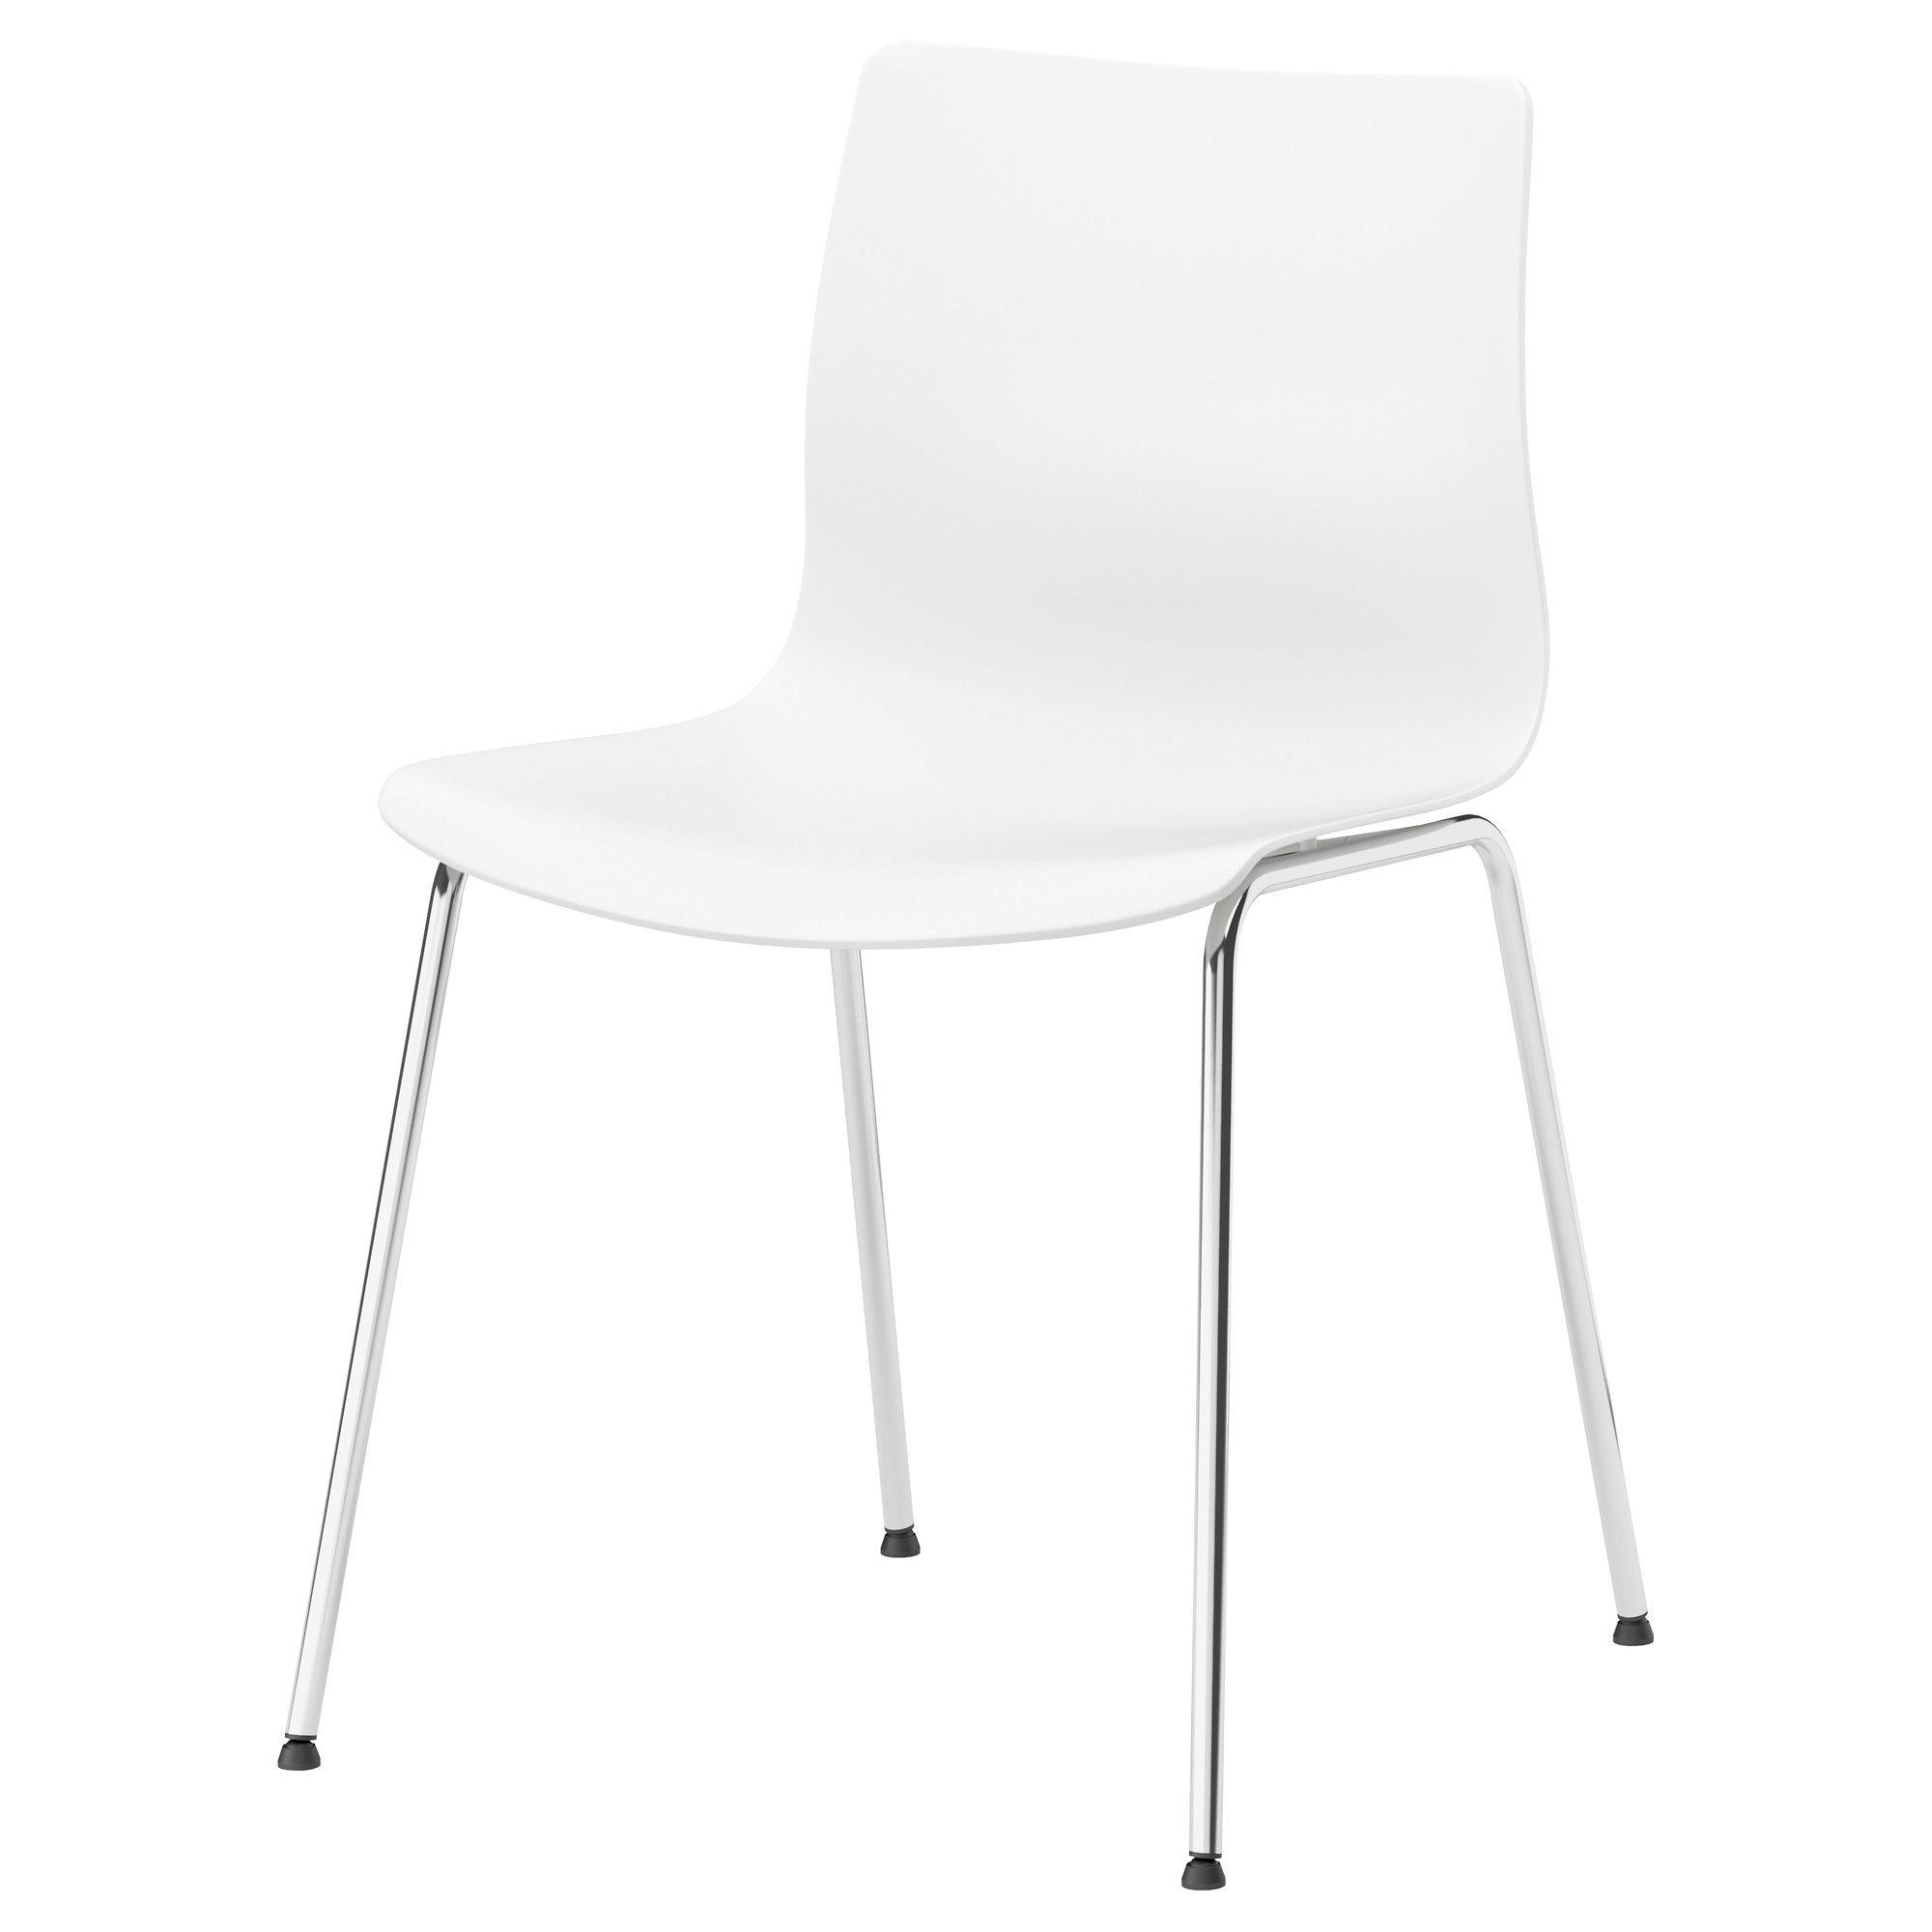 Meubles Et Accessoires Ikea Ikea Chair Ikea Shopping